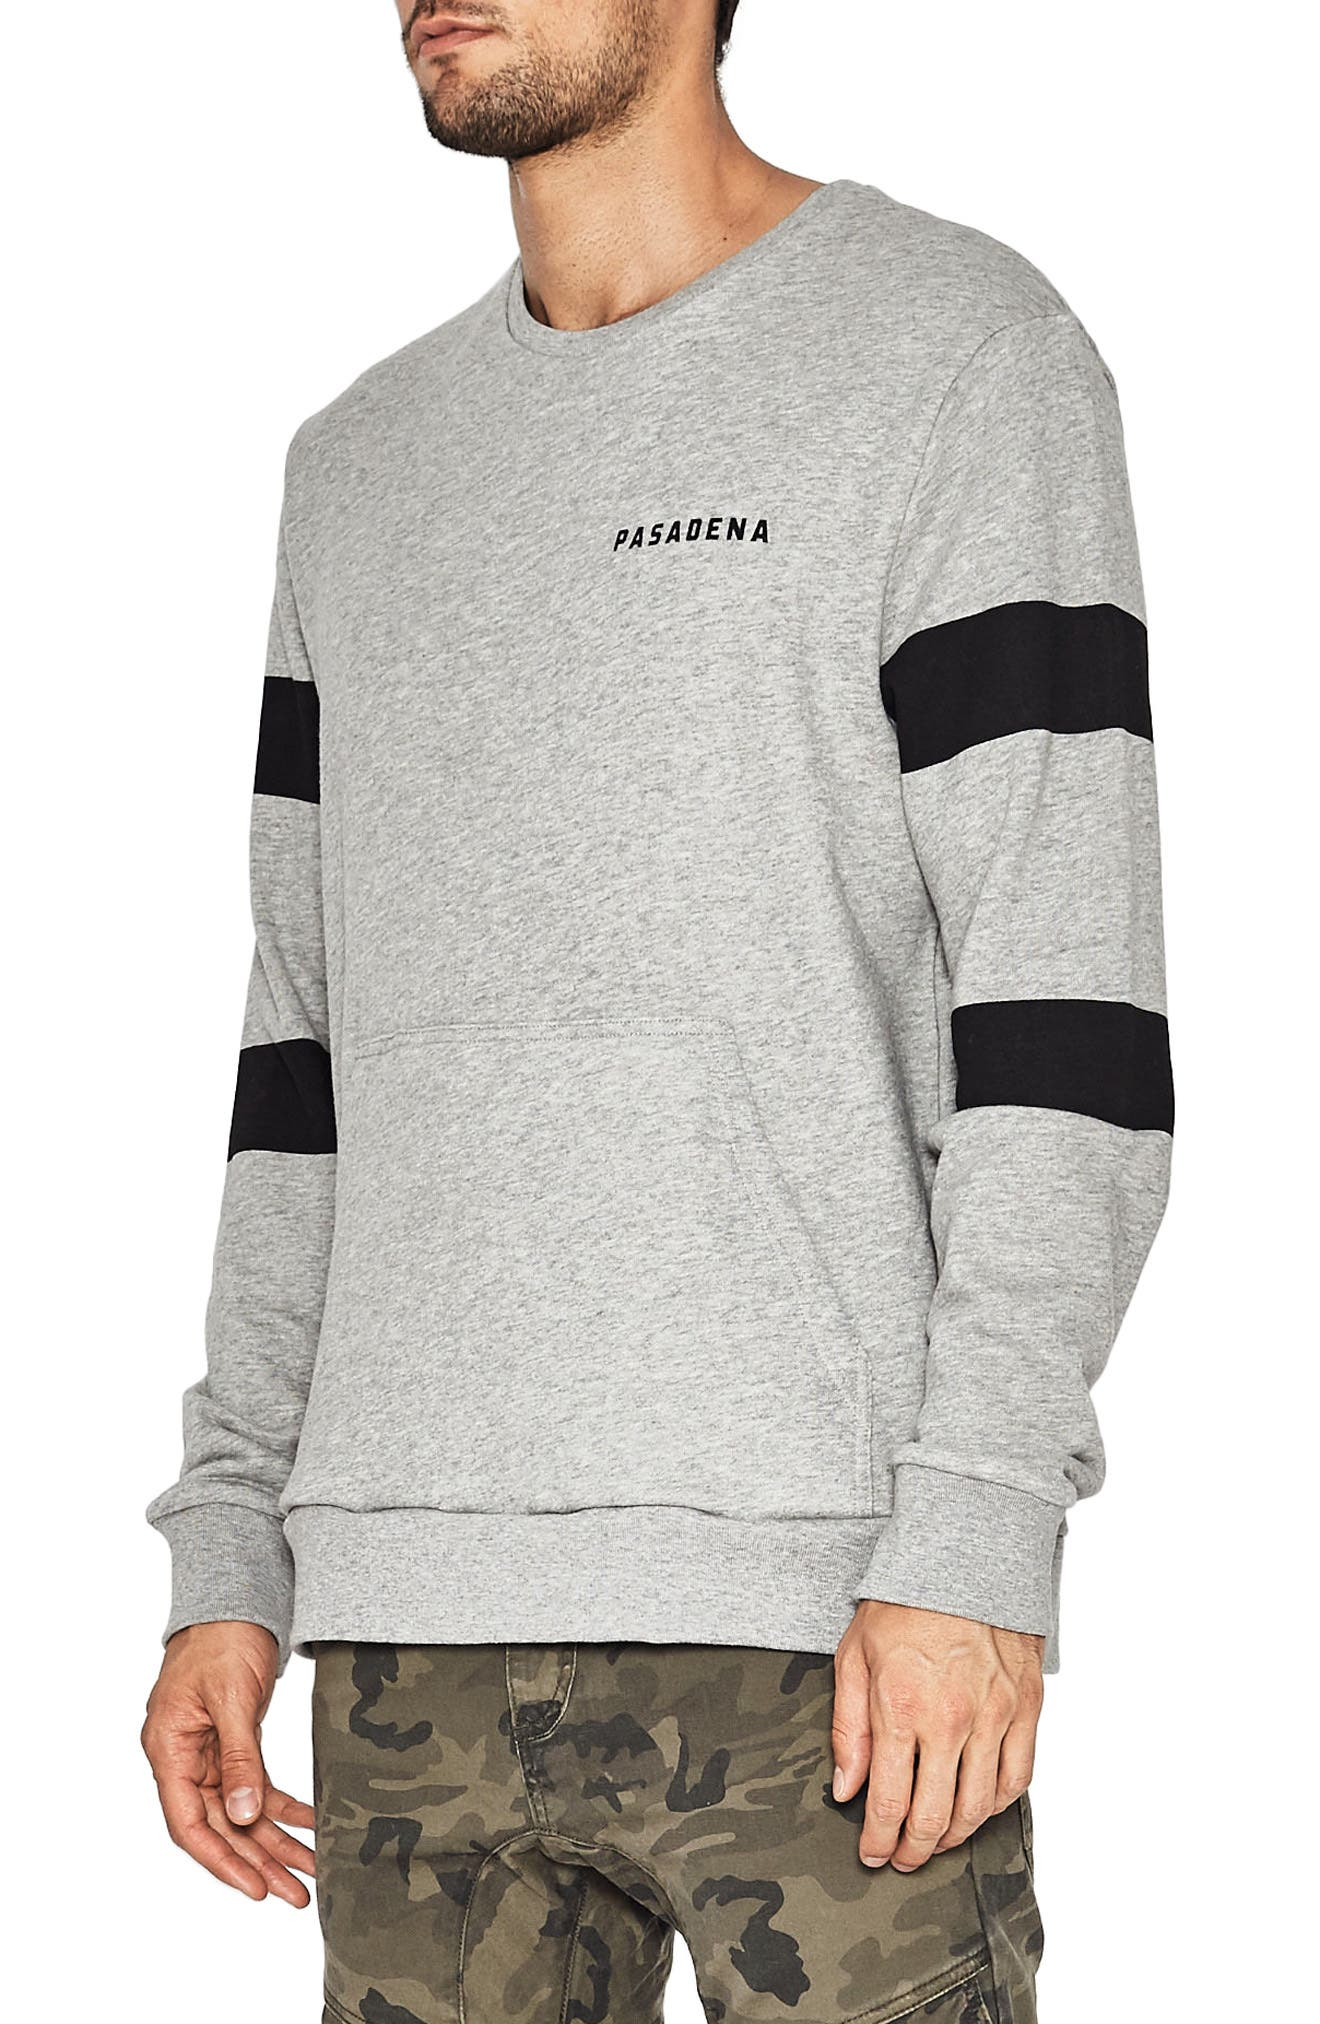 Turbo Hawk Sweatshirt,                             Alternate thumbnail 3, color,                             062